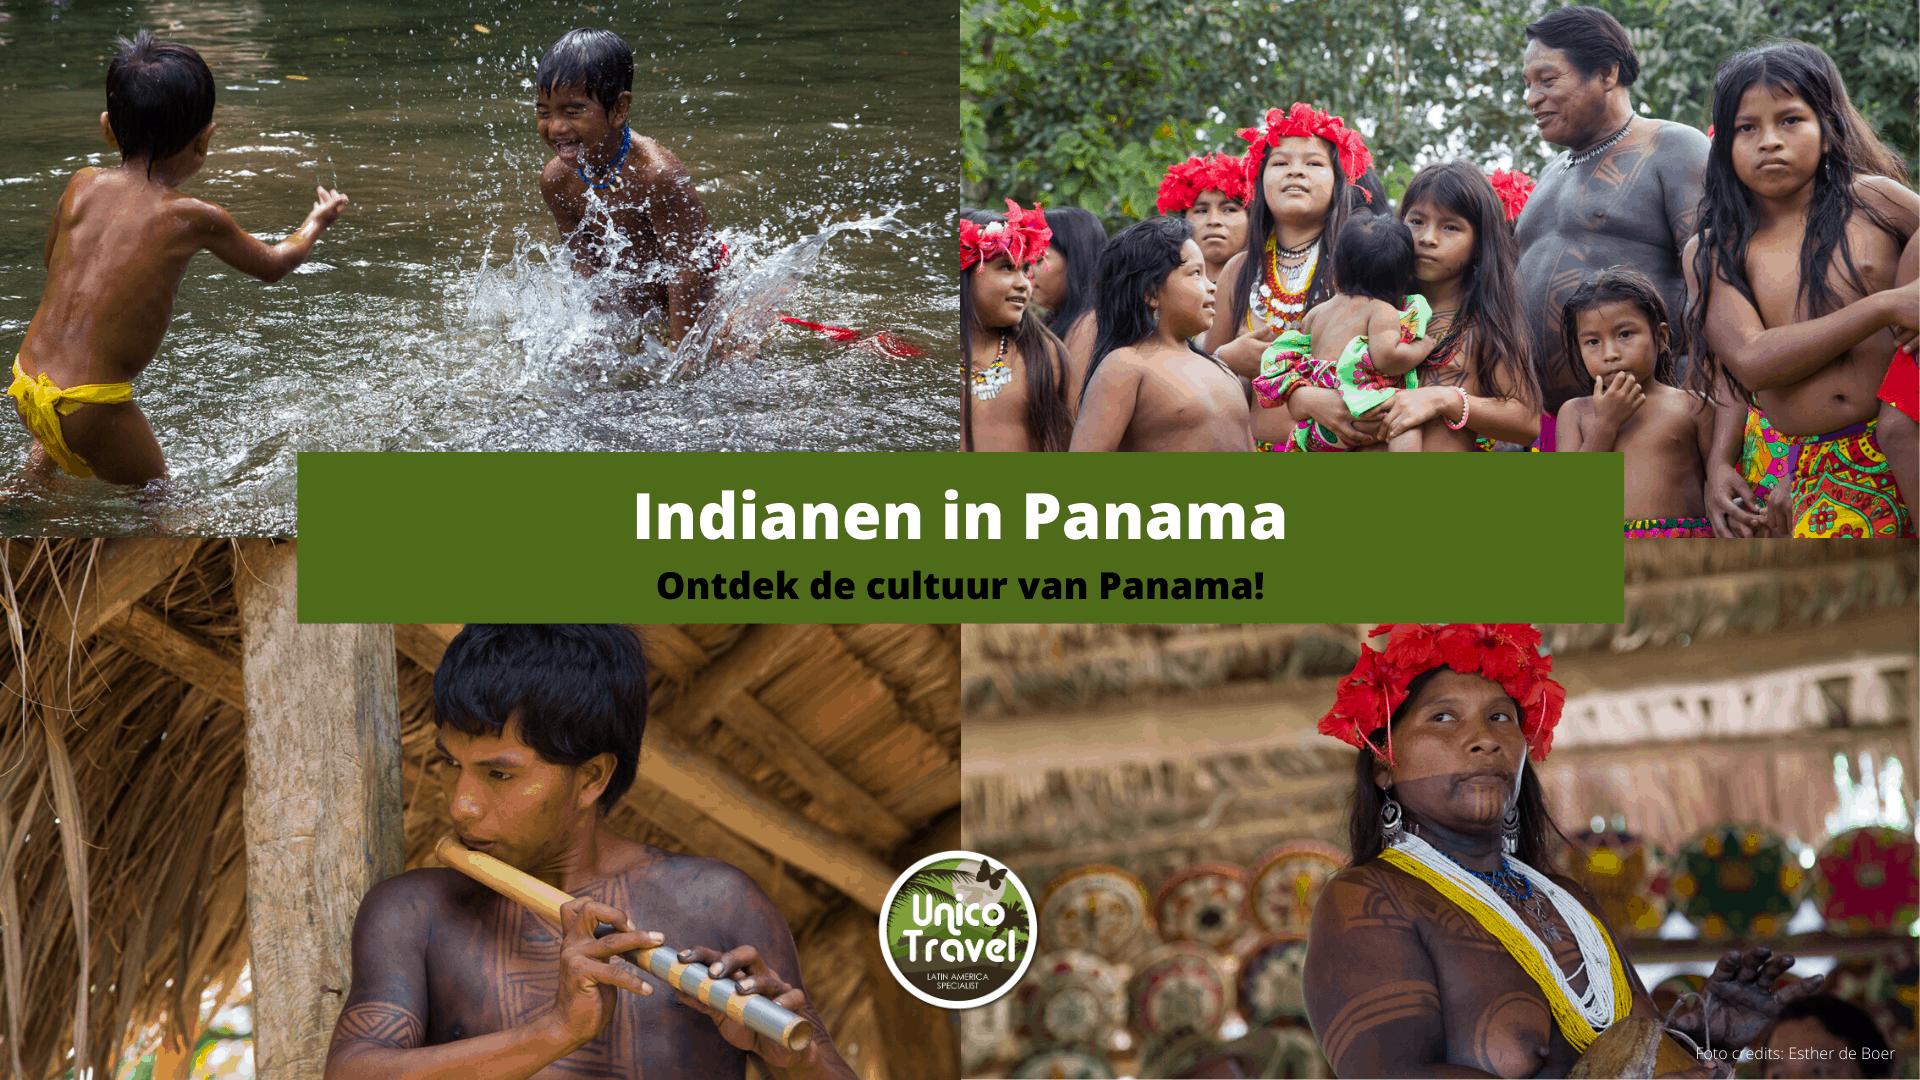 Indianen in Panama